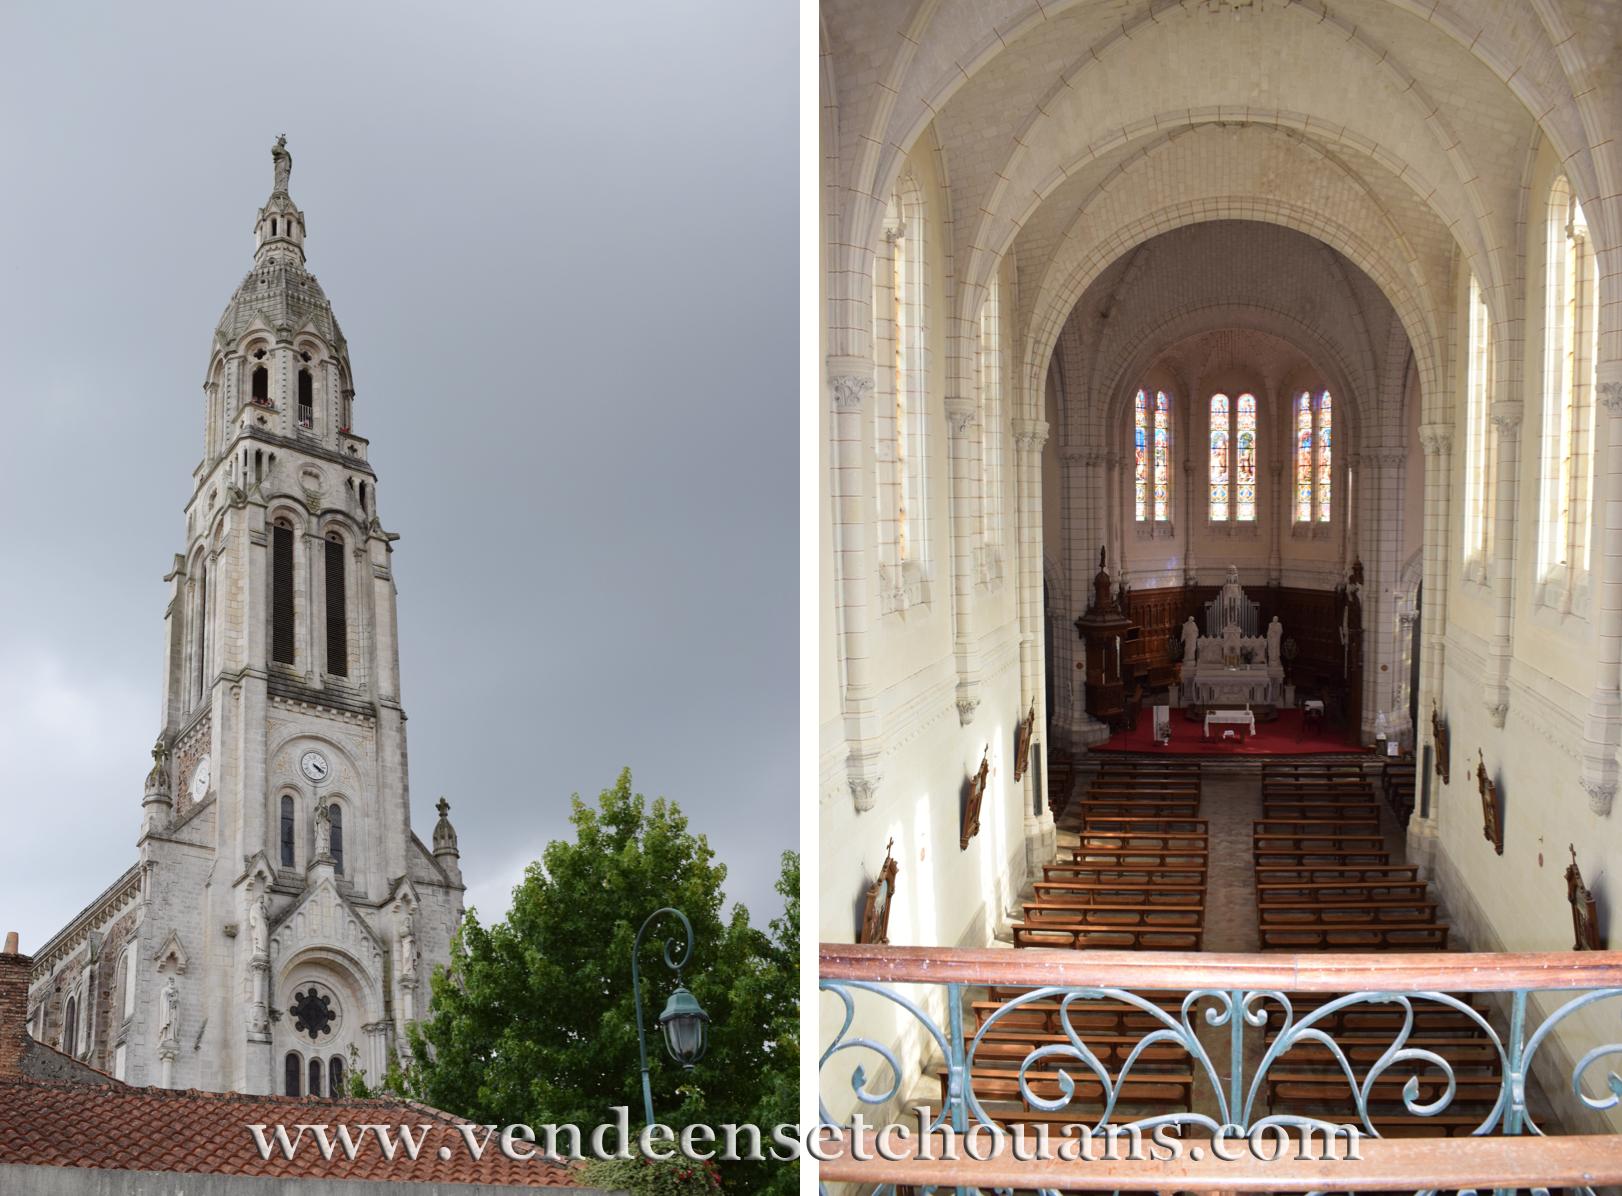 Visite de Saint-Lumine-de-Coutais